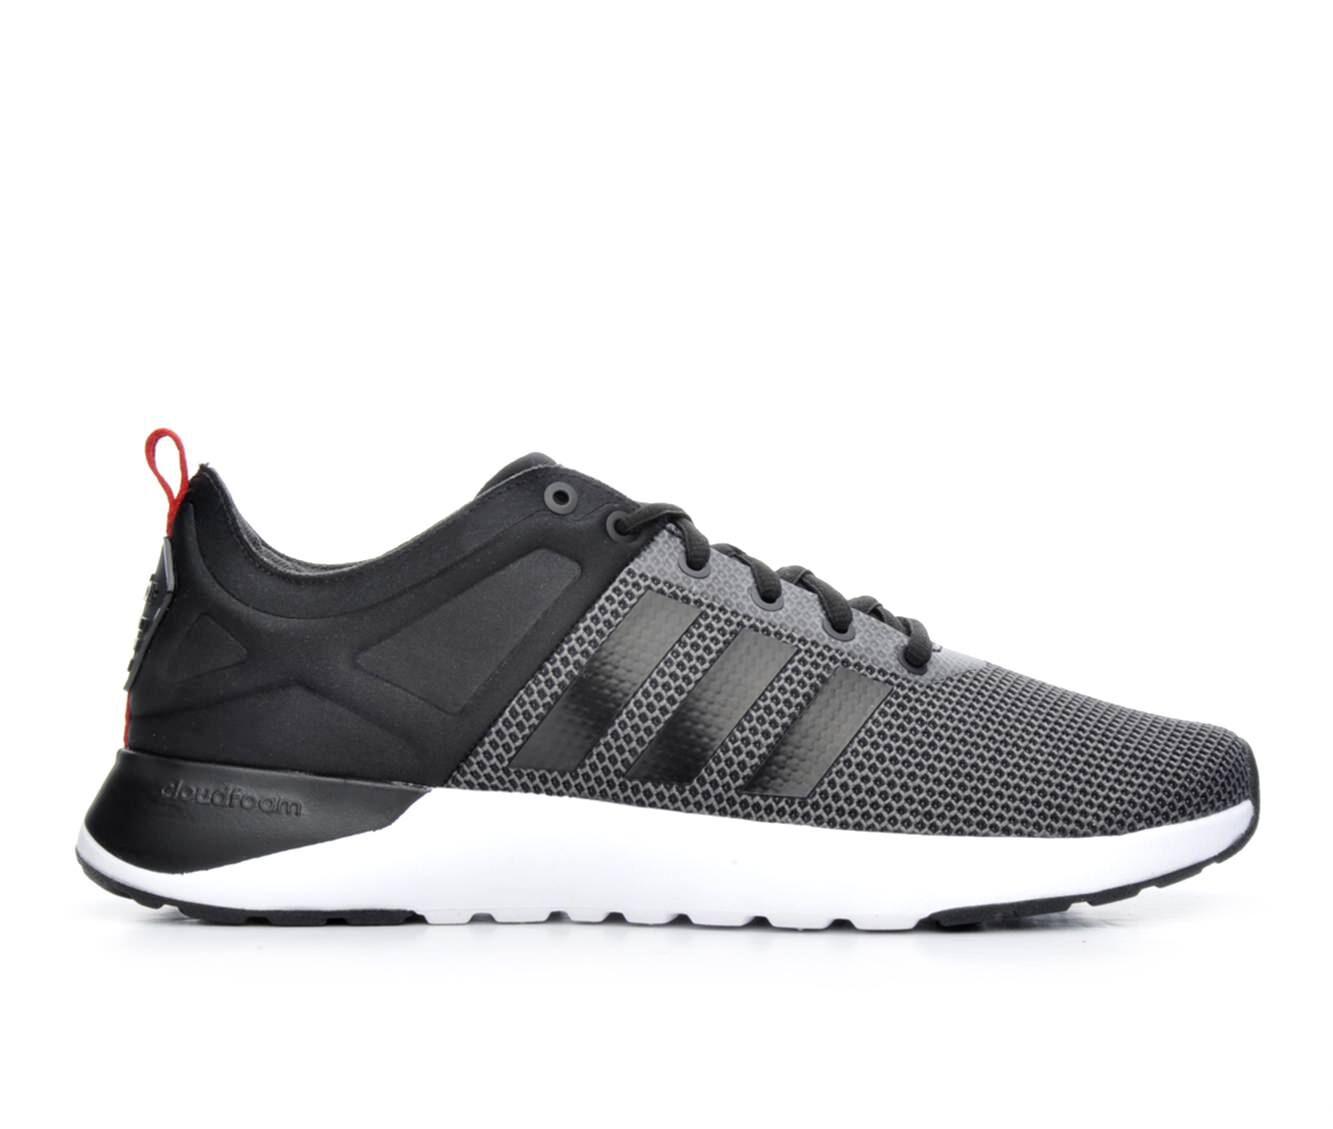 Men\u0026#39;s Adidas Cloudfoam Super Racer Running Shoes